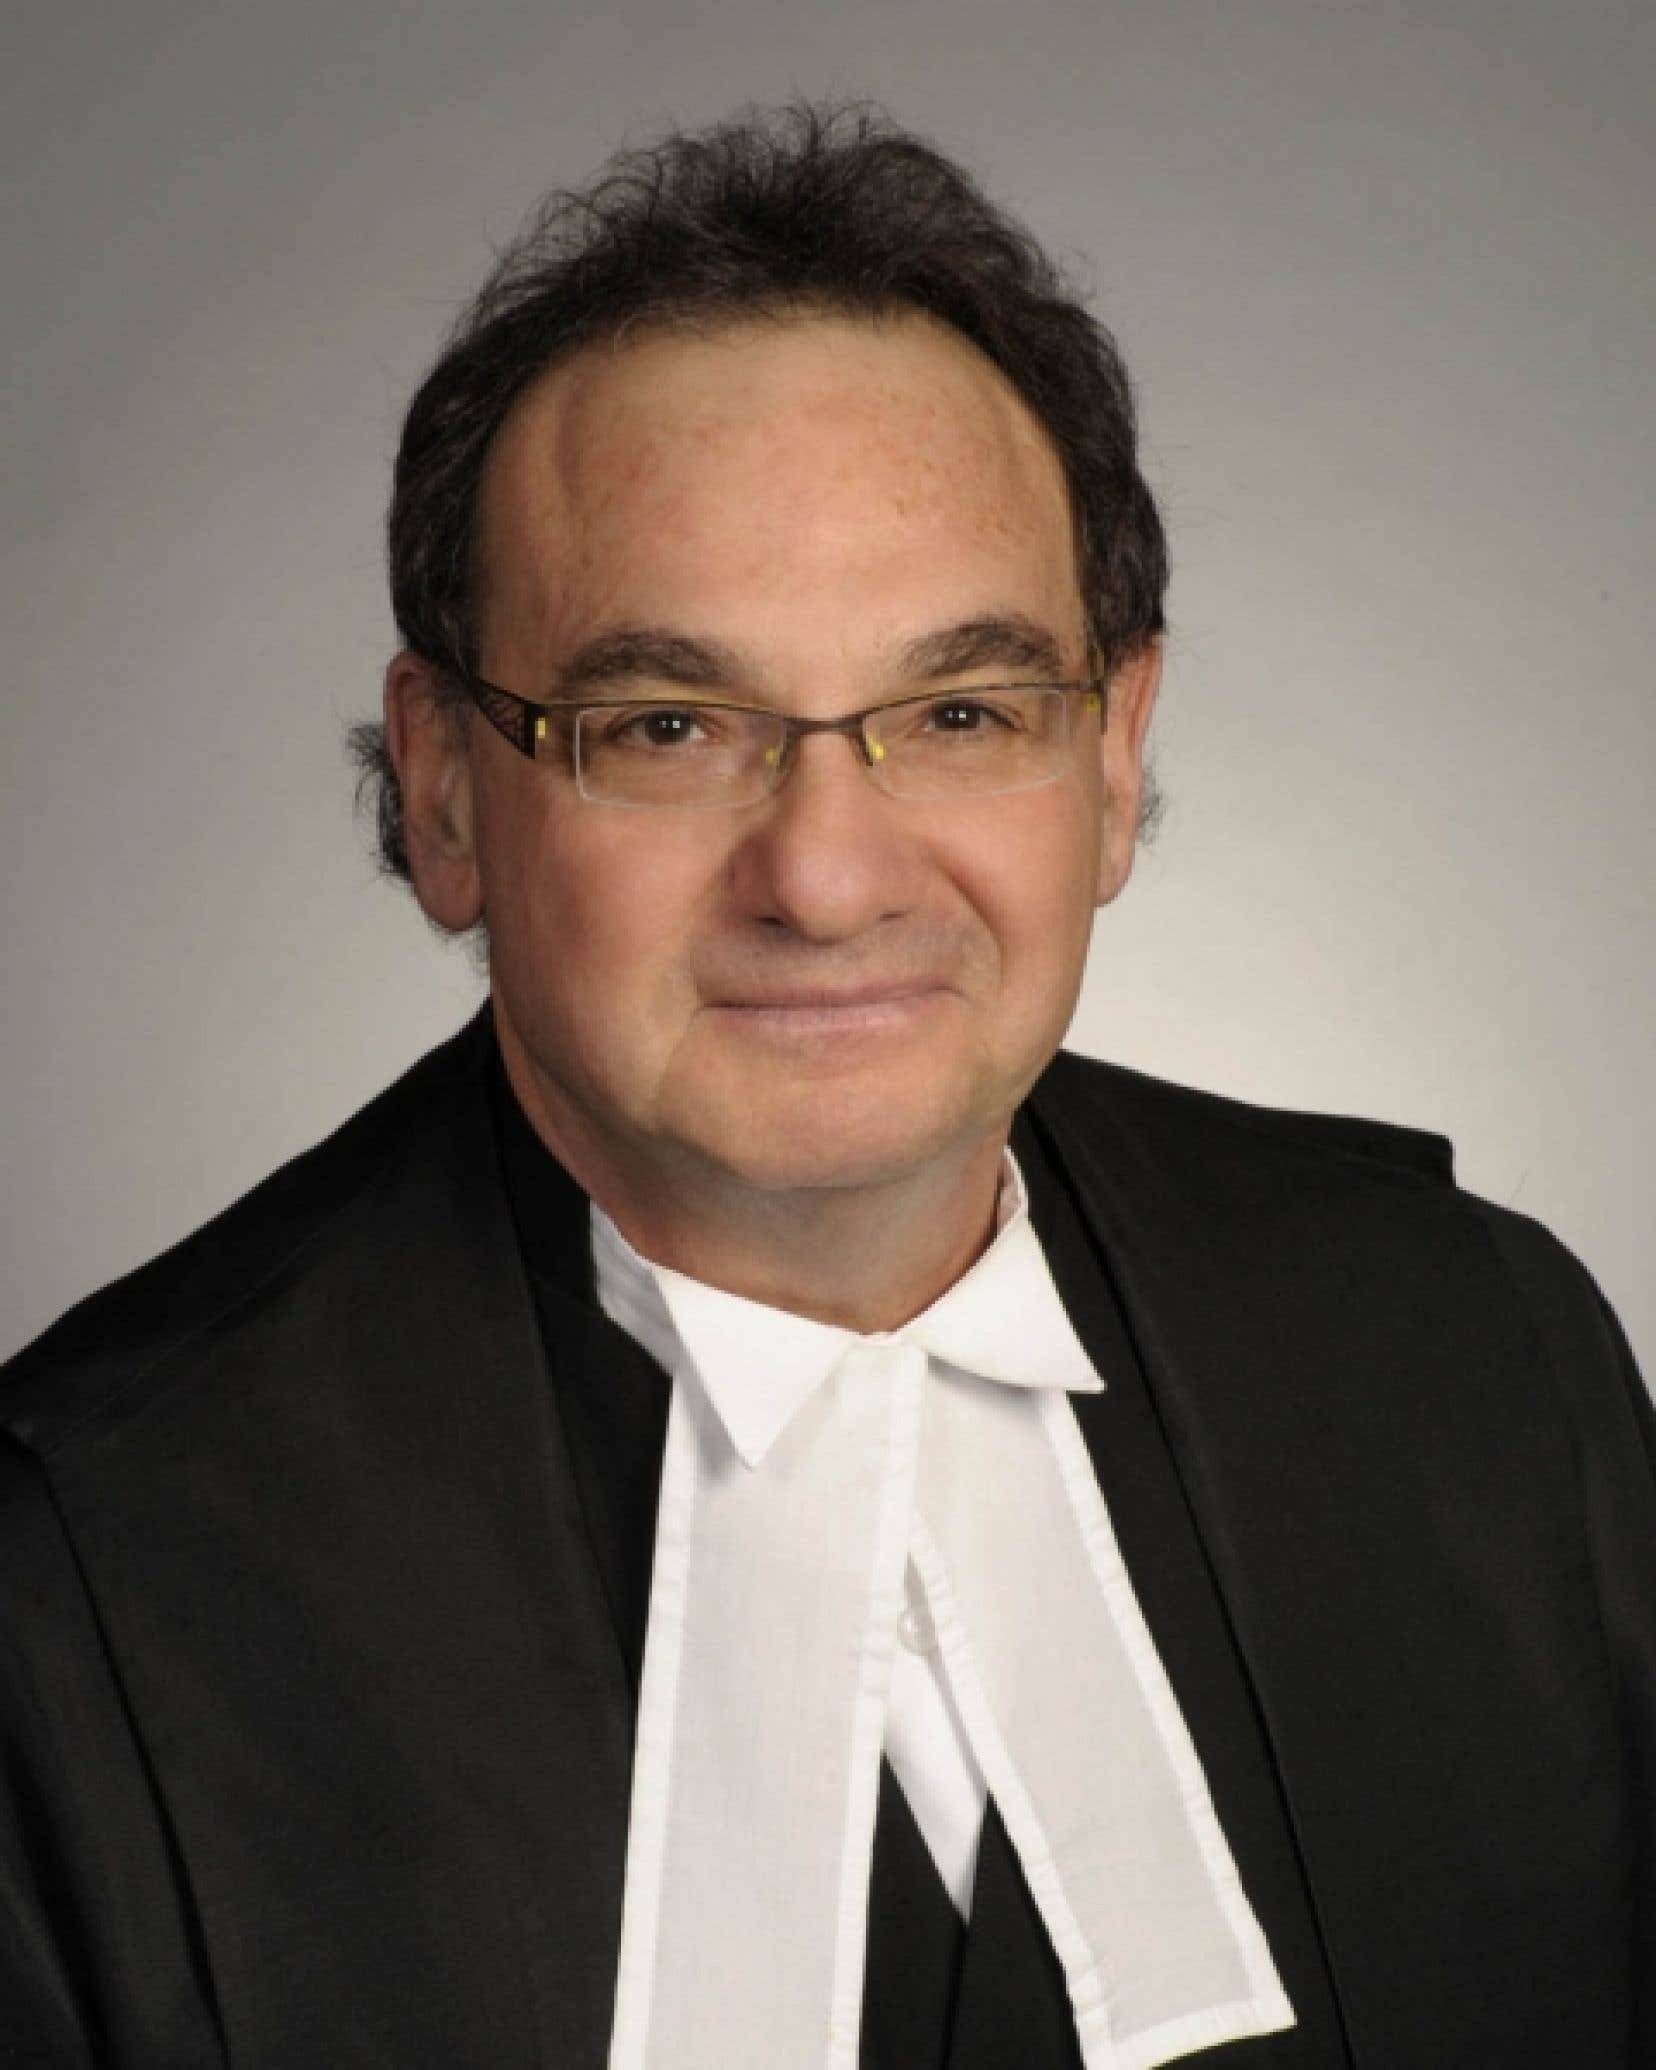 Michael Moldaver